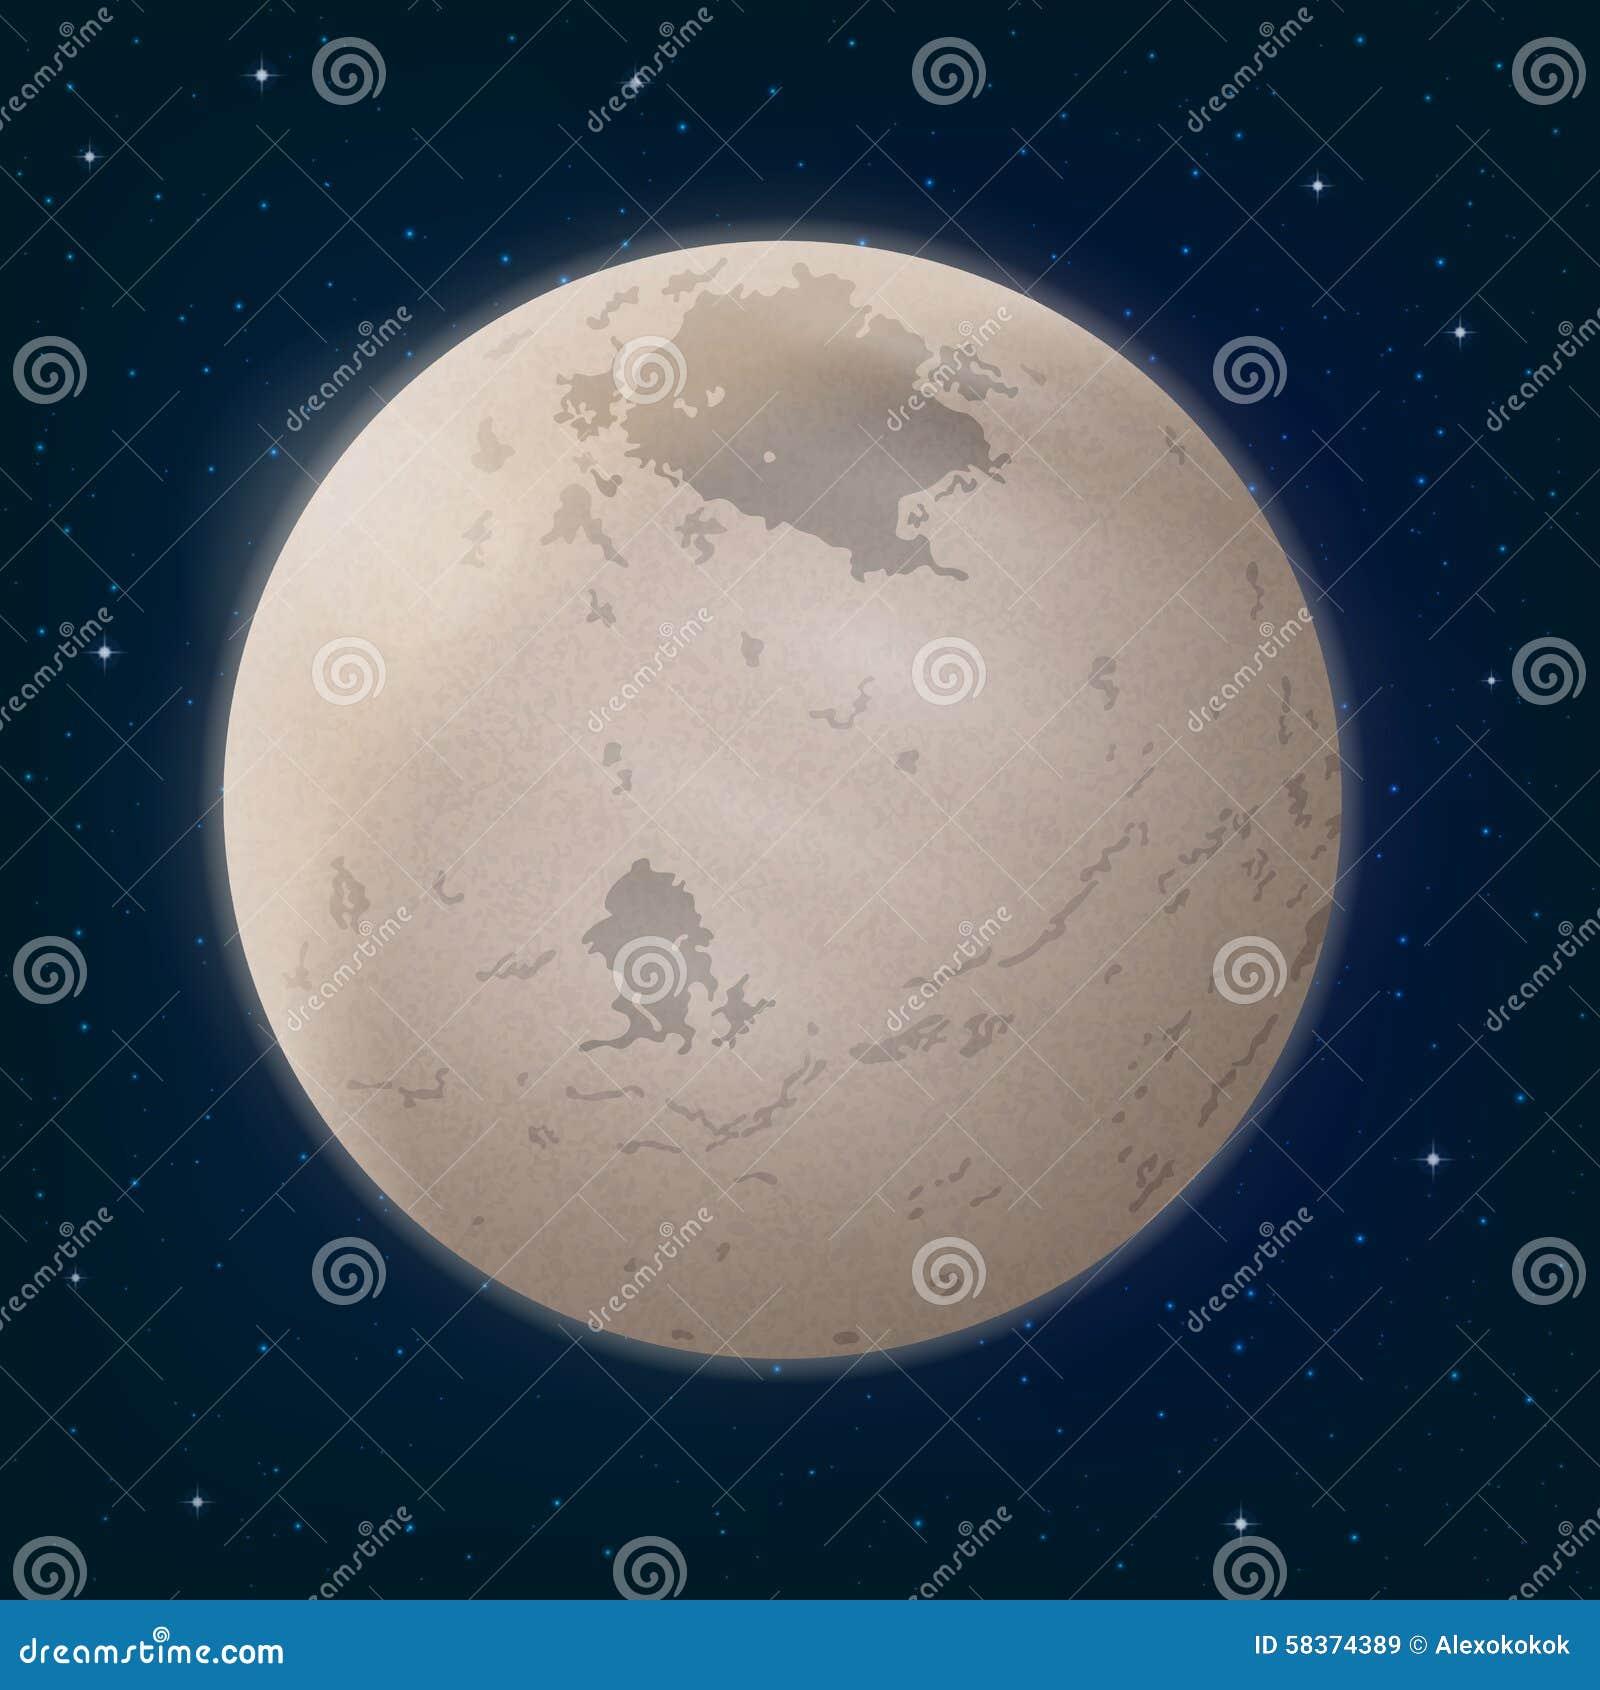 elements present on planet pluto - photo #22